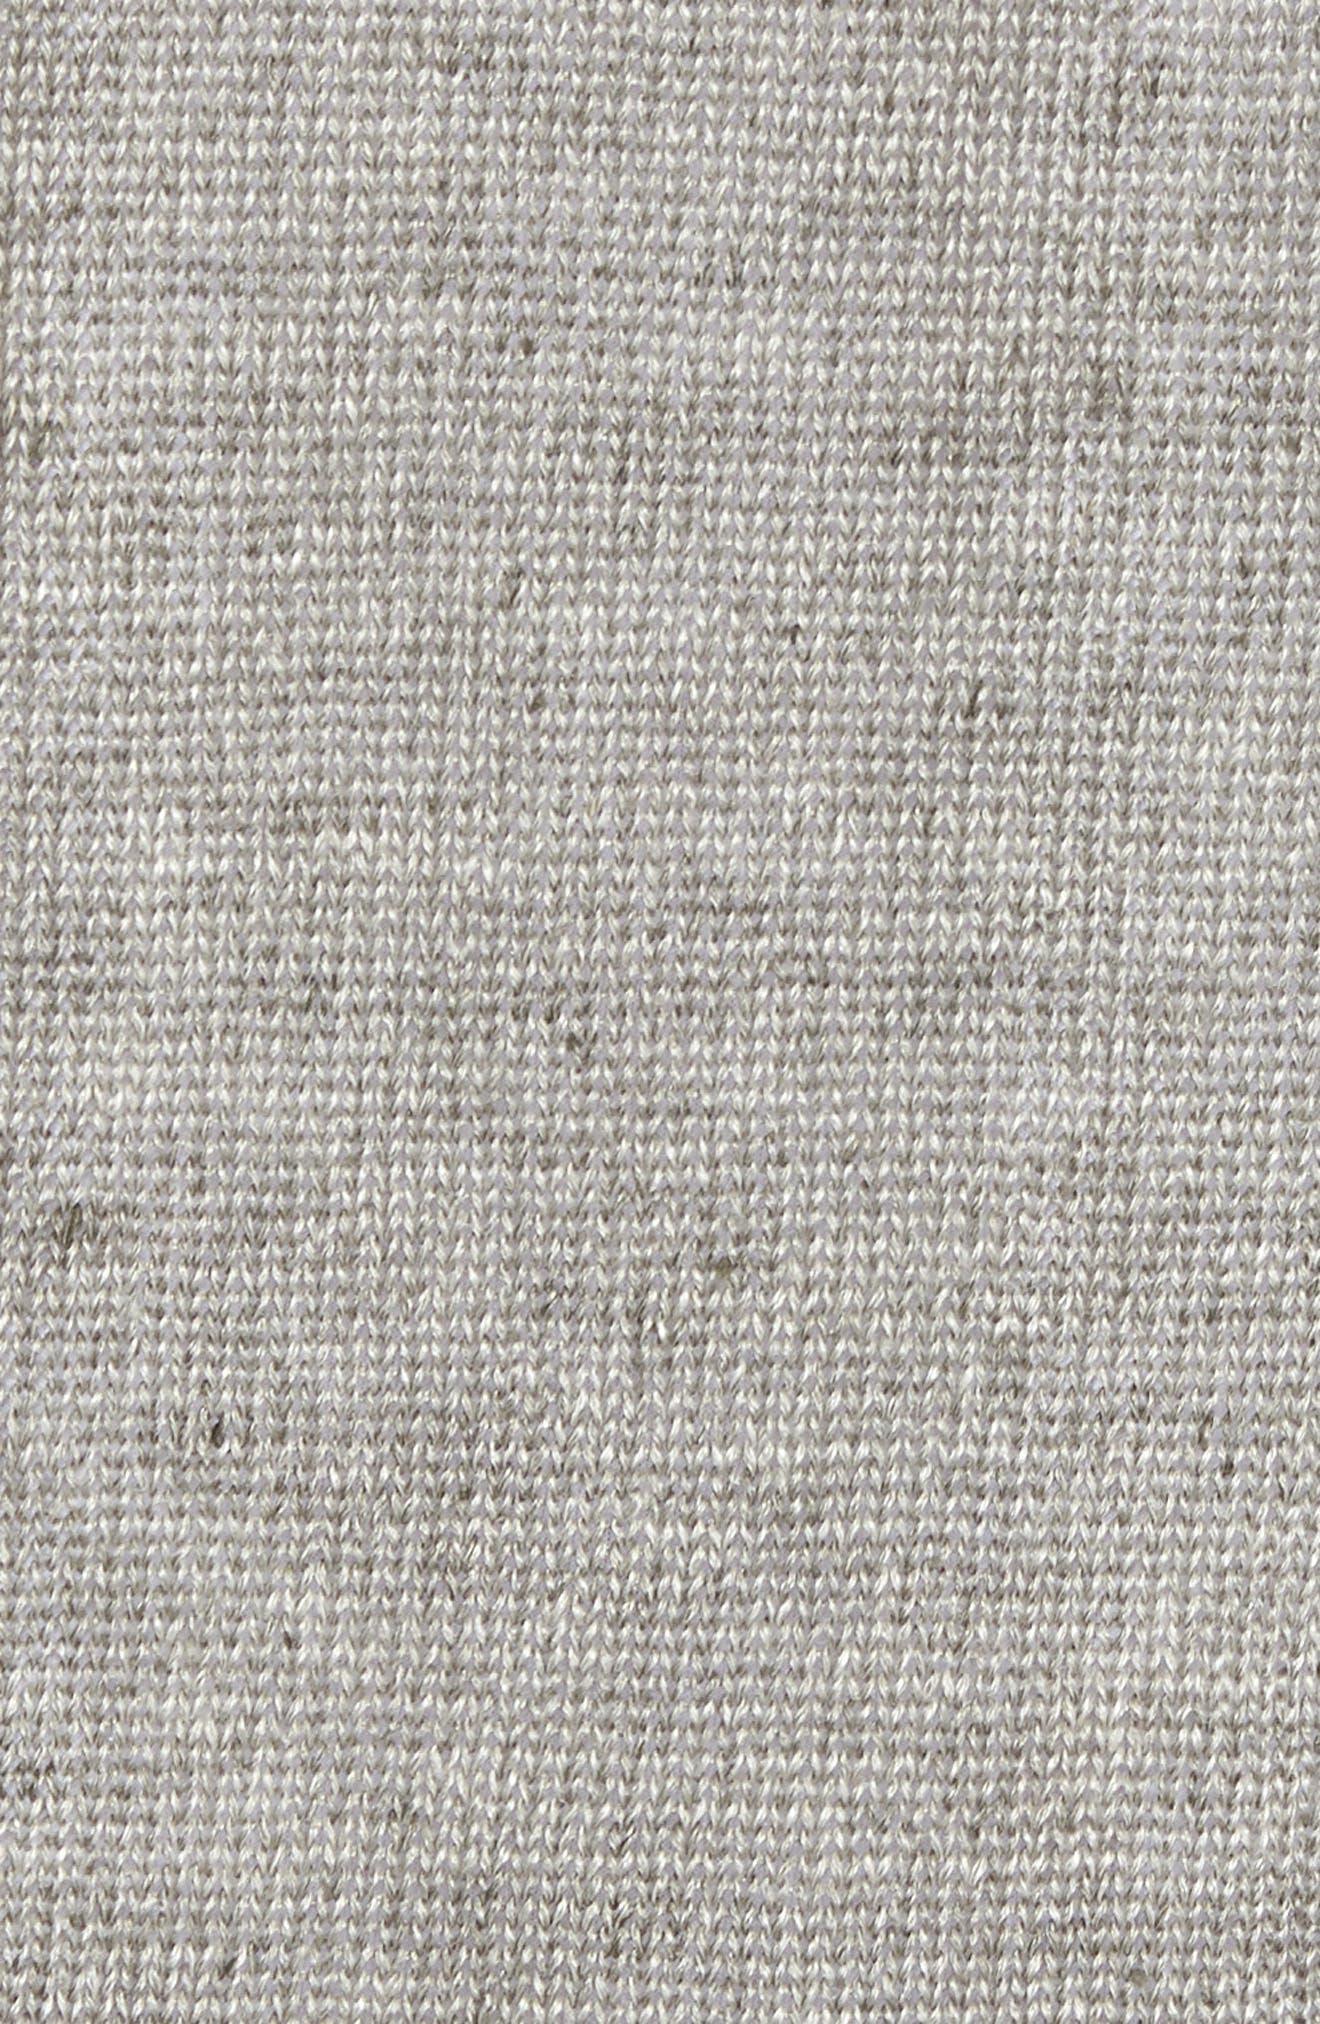 Slim Fit Linen Crewneck Sweater,                             Alternate thumbnail 5, color,                             Silver